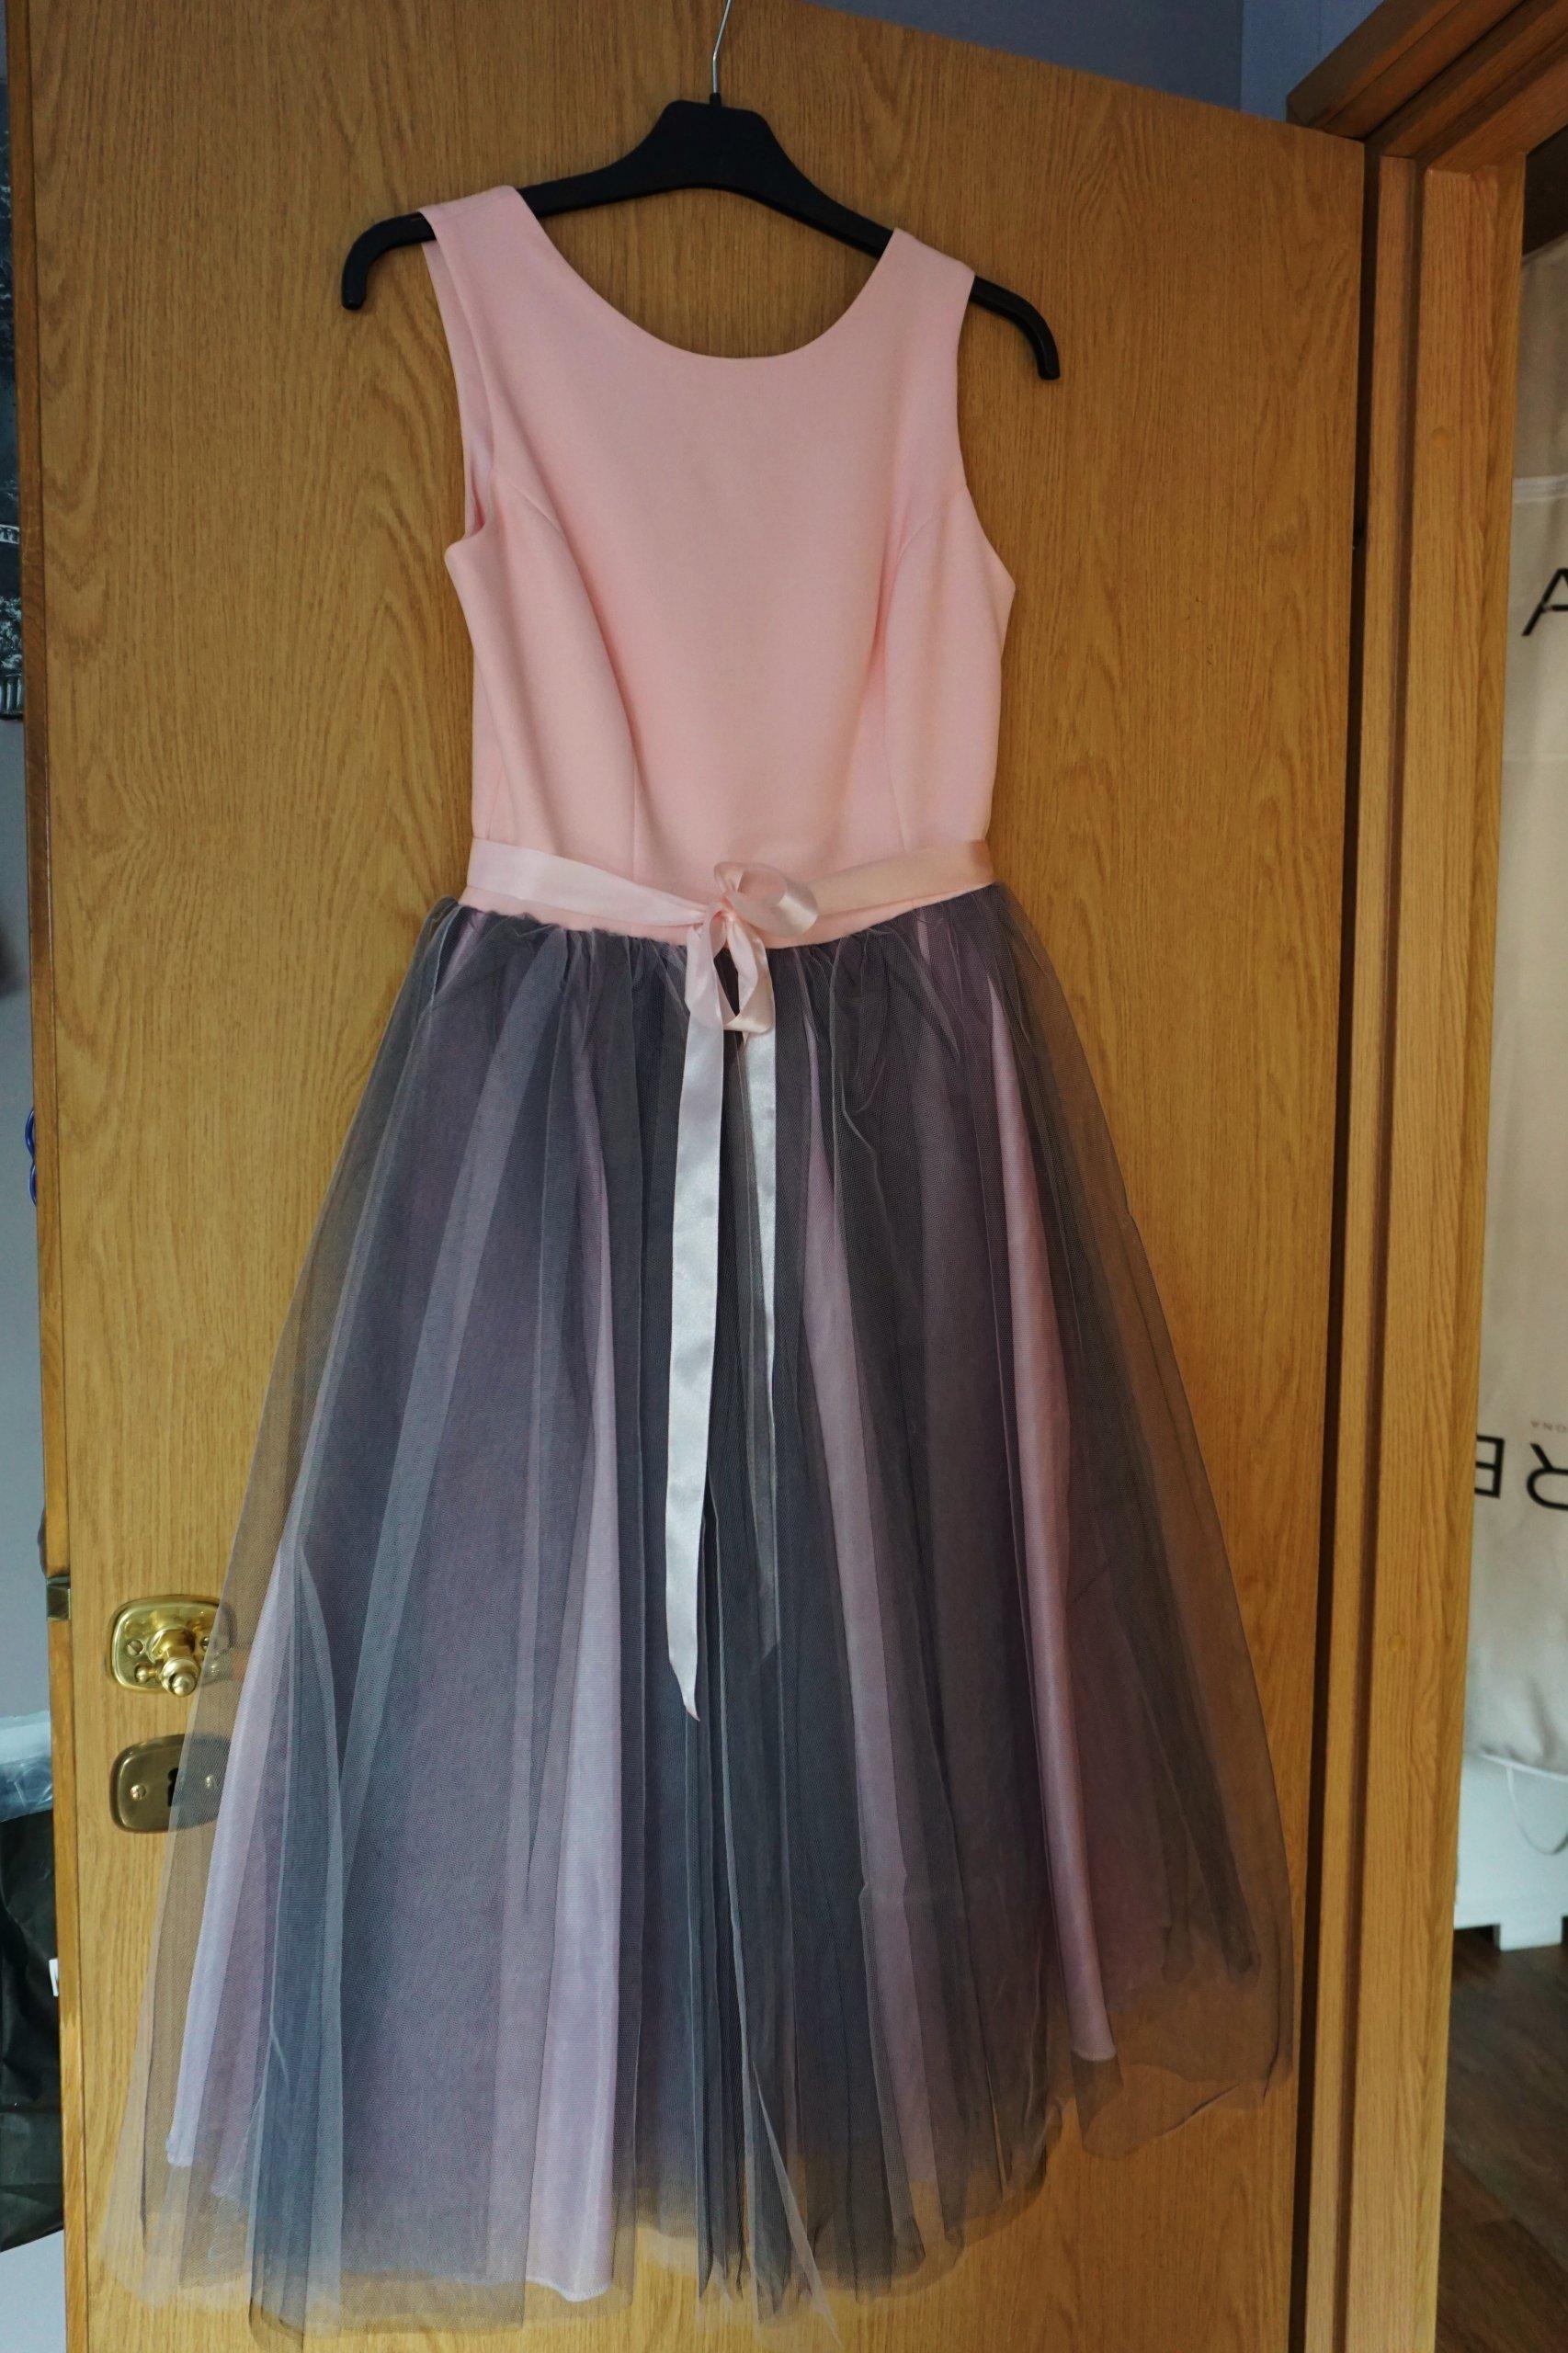 Piękna Sukienka Wesele Poprawiny 36 Tiulowa 6956456931 Oficjalne